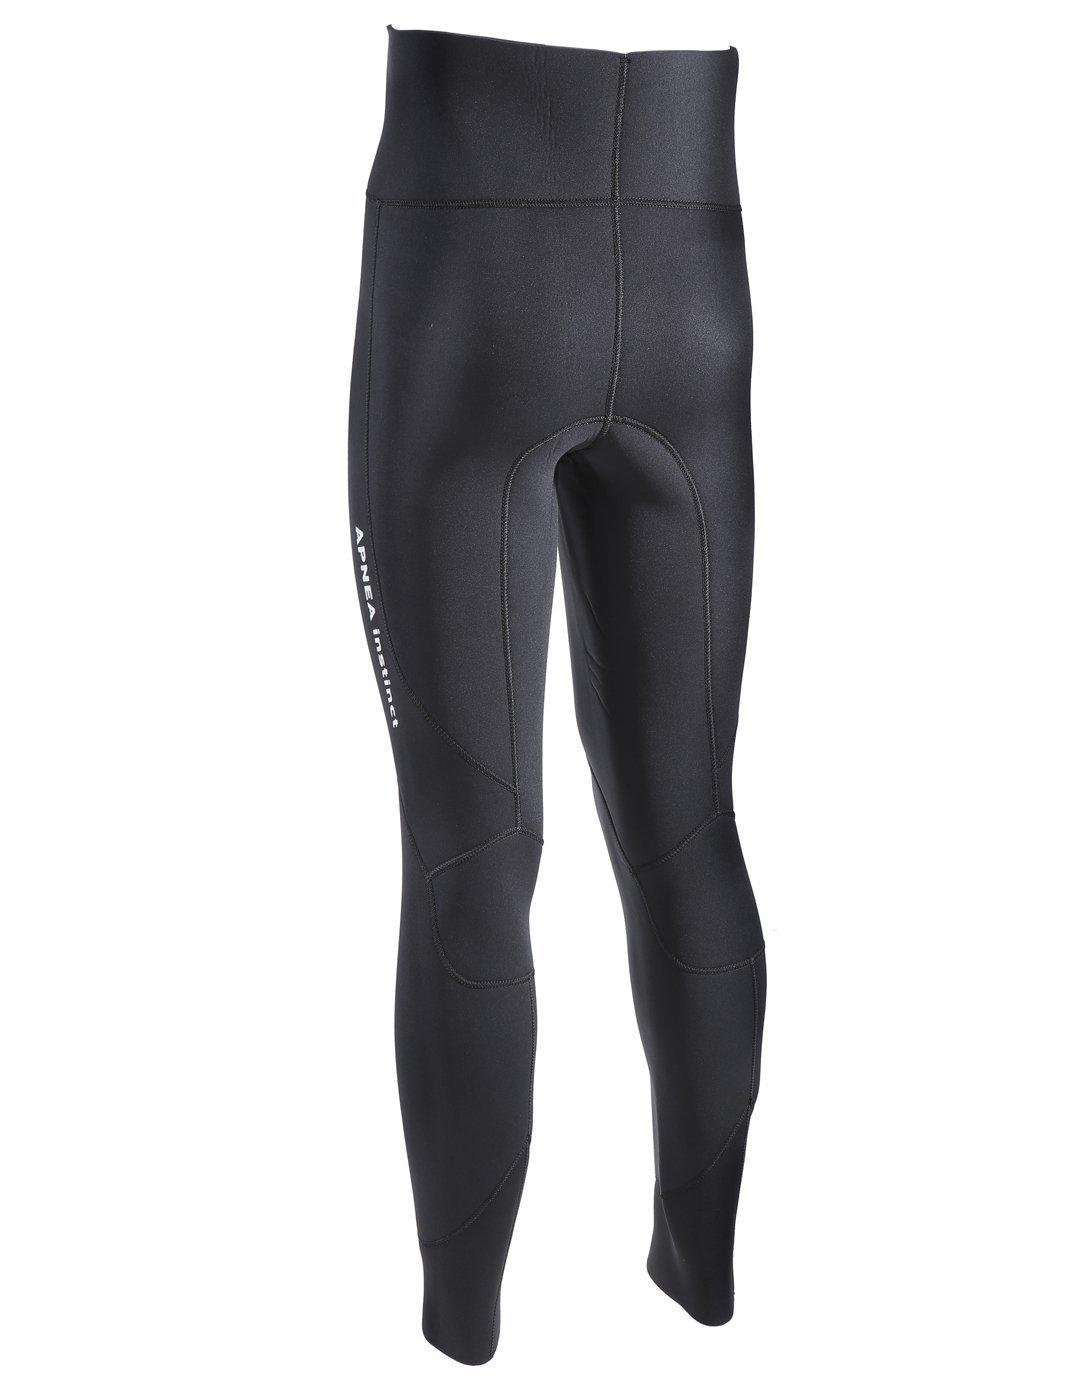 Amazon.com   Mares Women s 5mm Apnea Instinct 50 Wetsuit Pants   Sports    Outdoors a0ca3fdbb